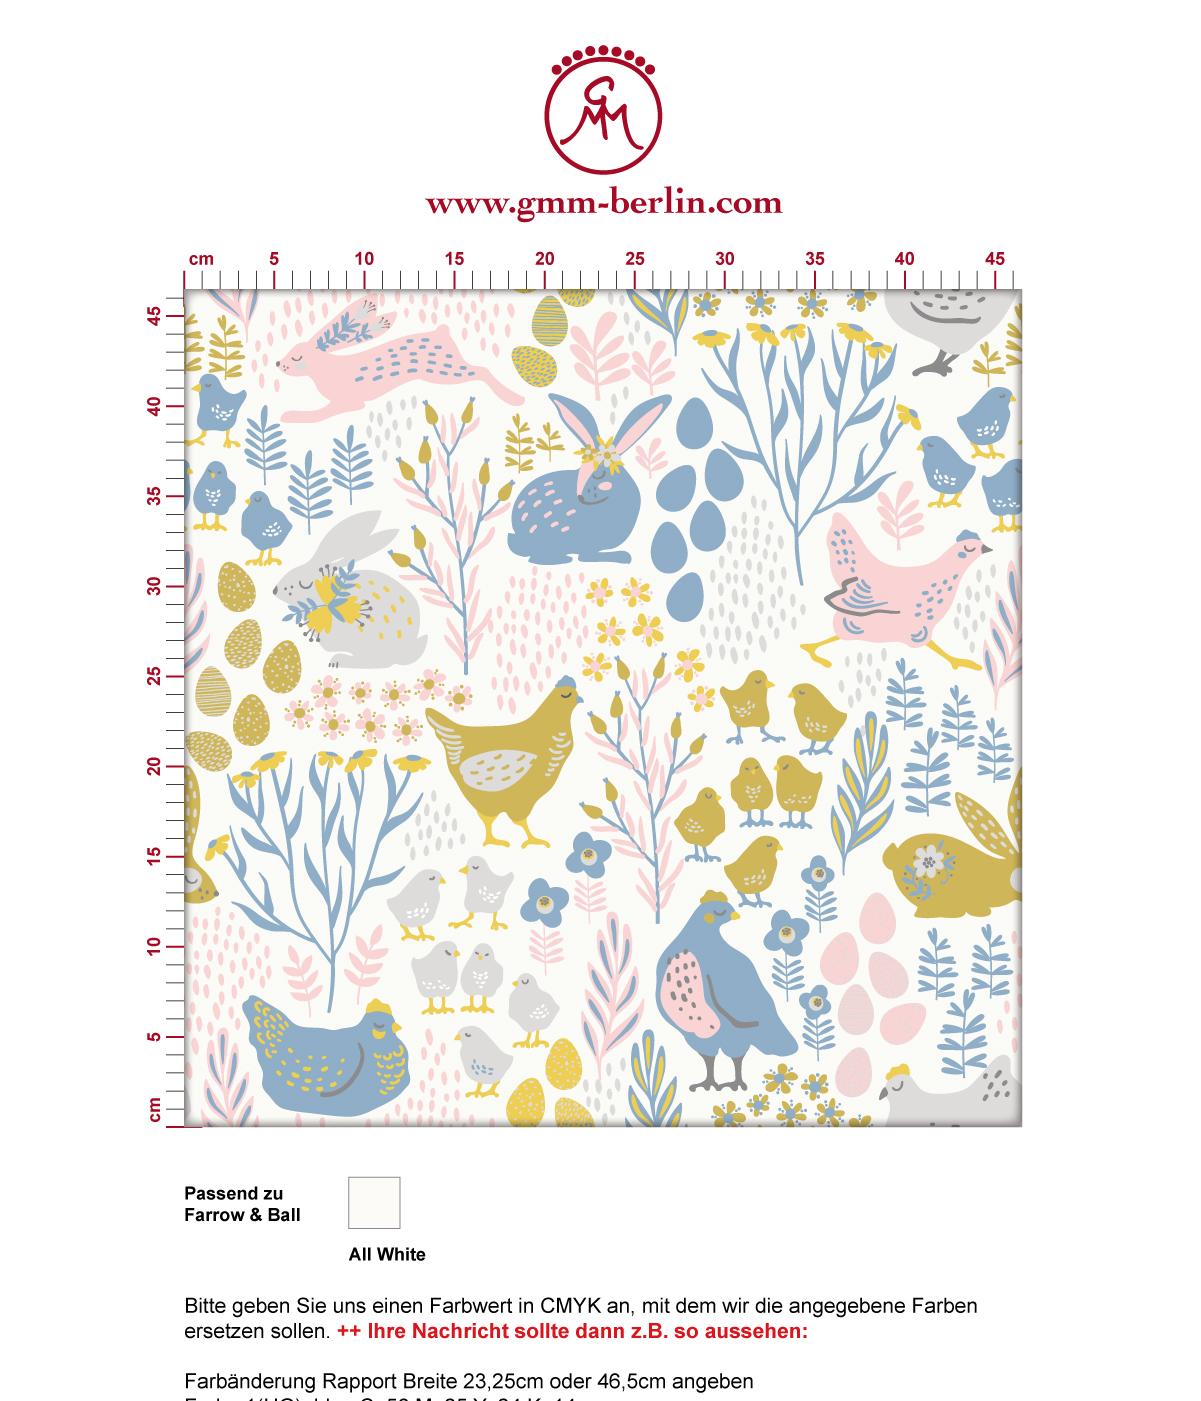 "Land Tapete ""Hoppelgarten"" mit bunten Hühnern, Hasen und Blumen in Farbe 1 - groß angepasst an Farrow & Ball Wandfarben 3"